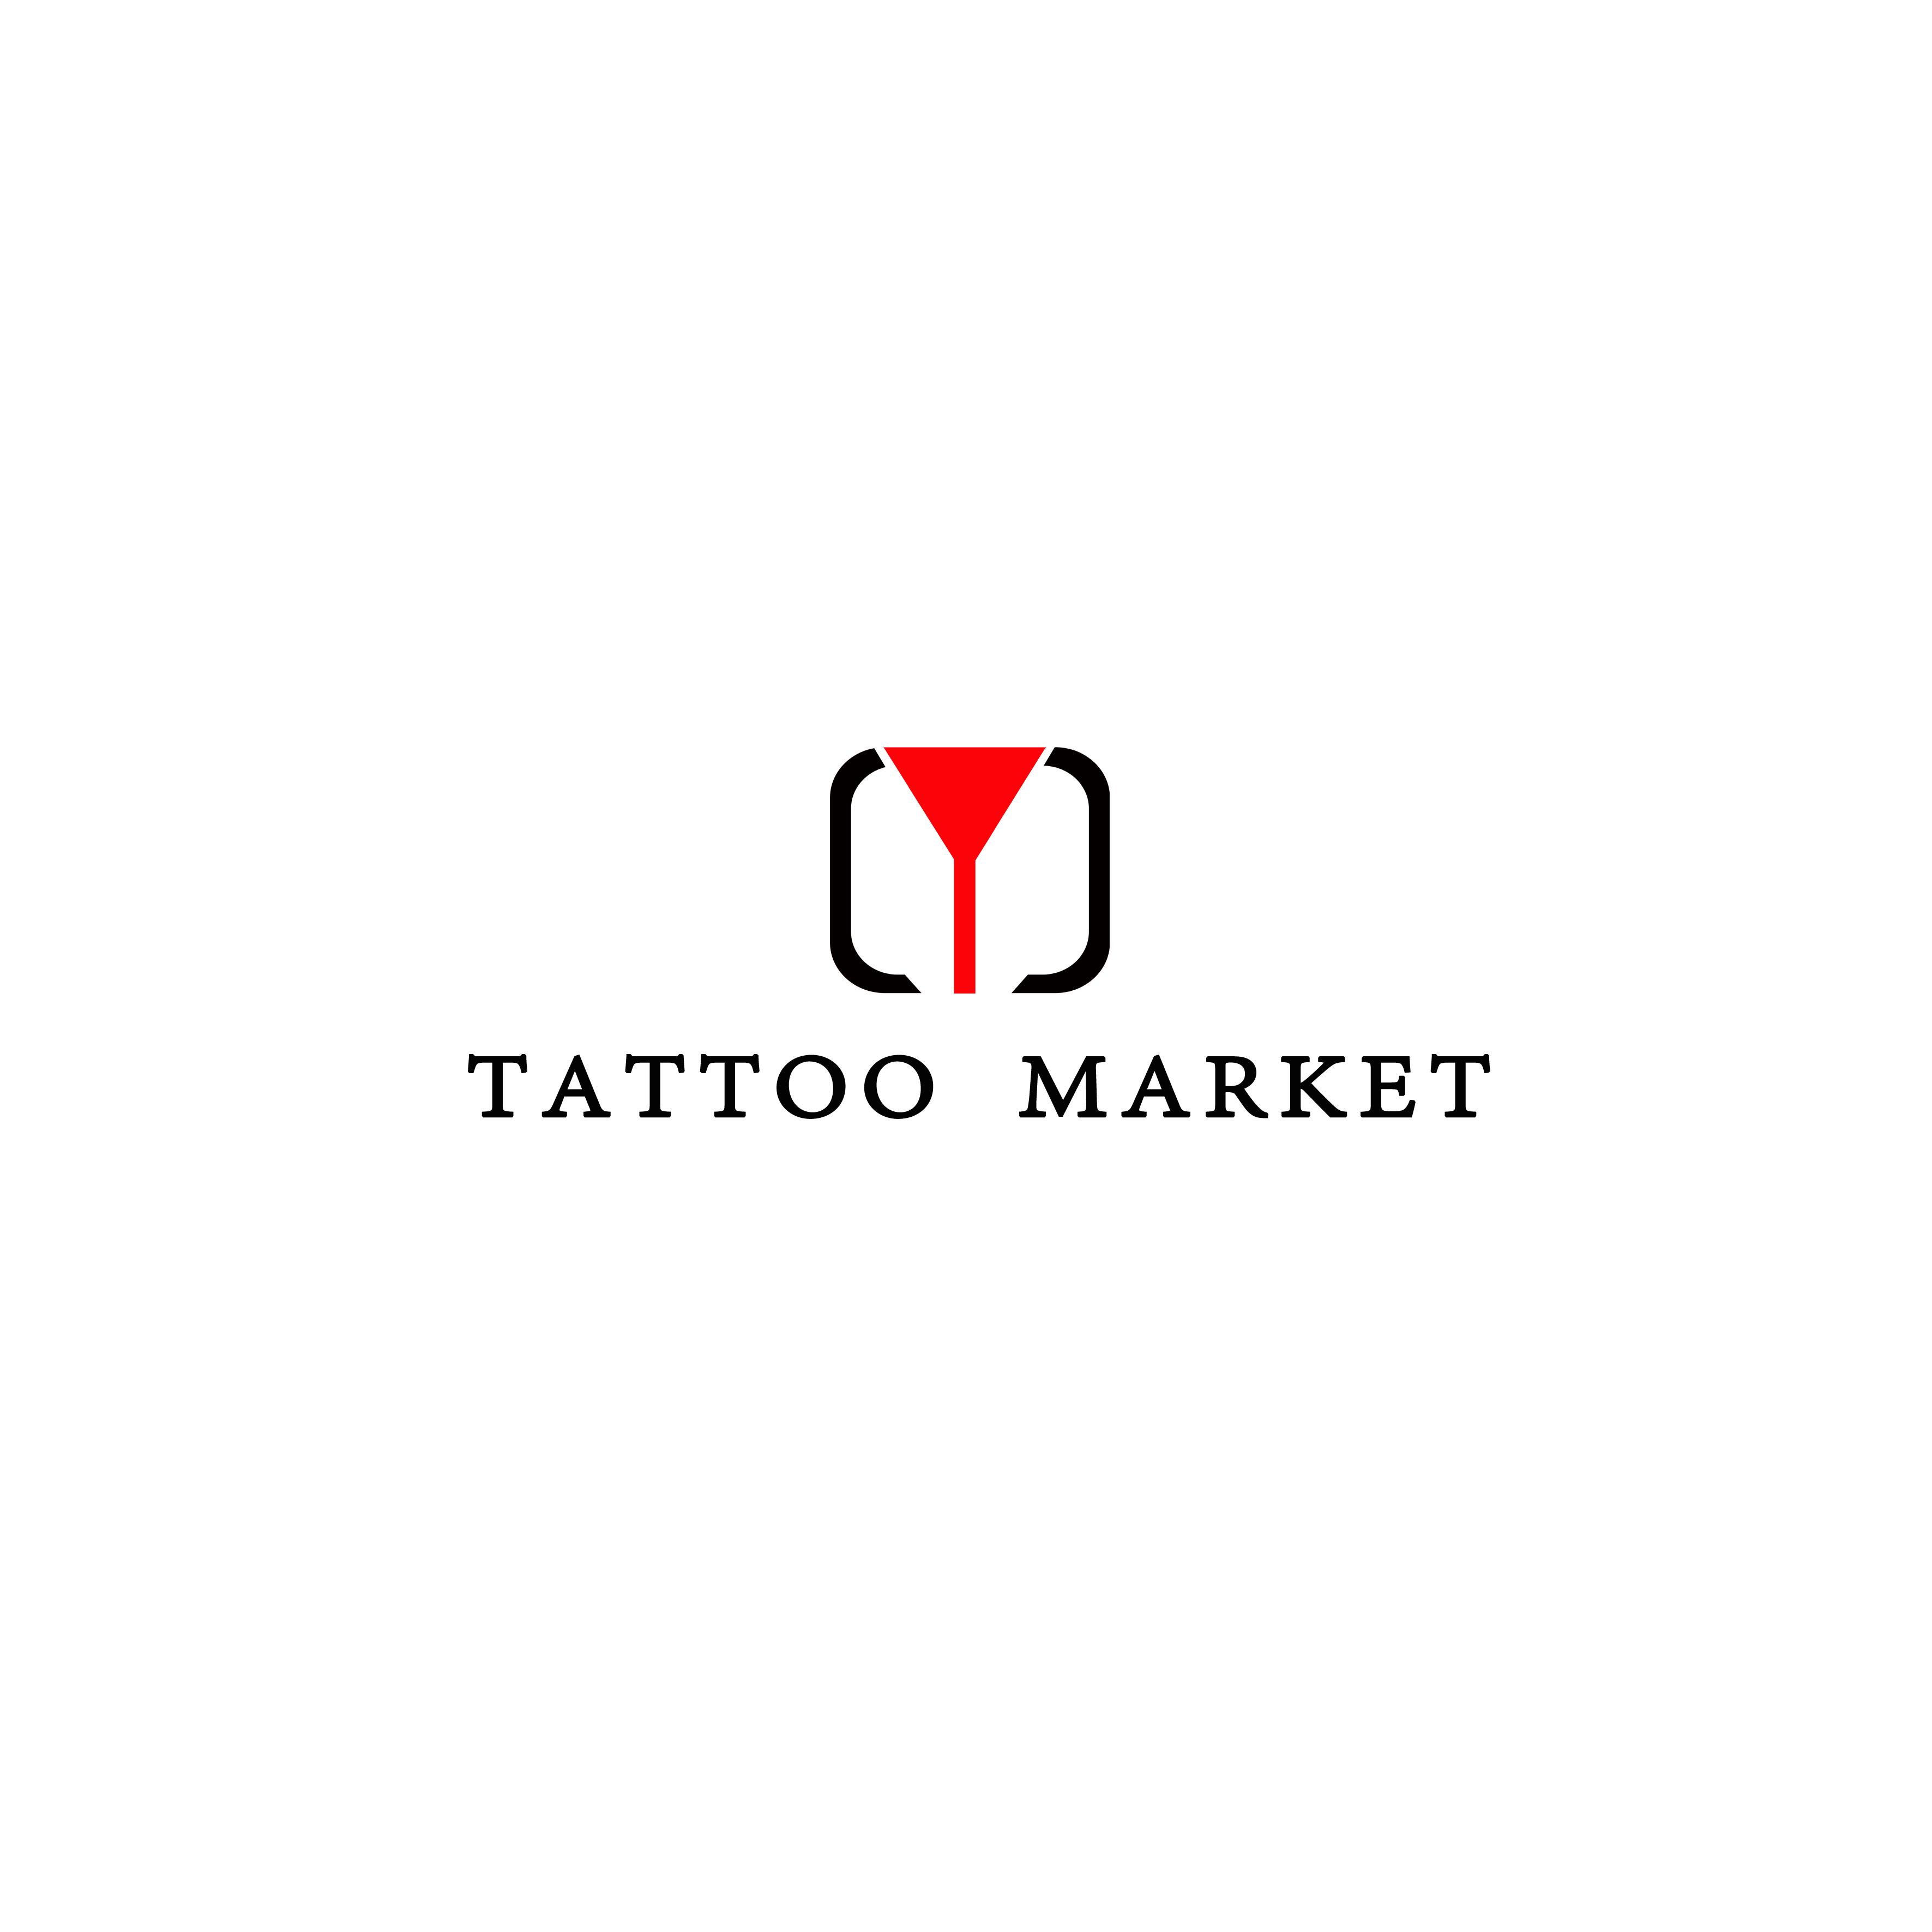 Редизайн логотипа магазина тату оборудования TattooMarket.ru фото f_3995c3c807ee495d.jpg